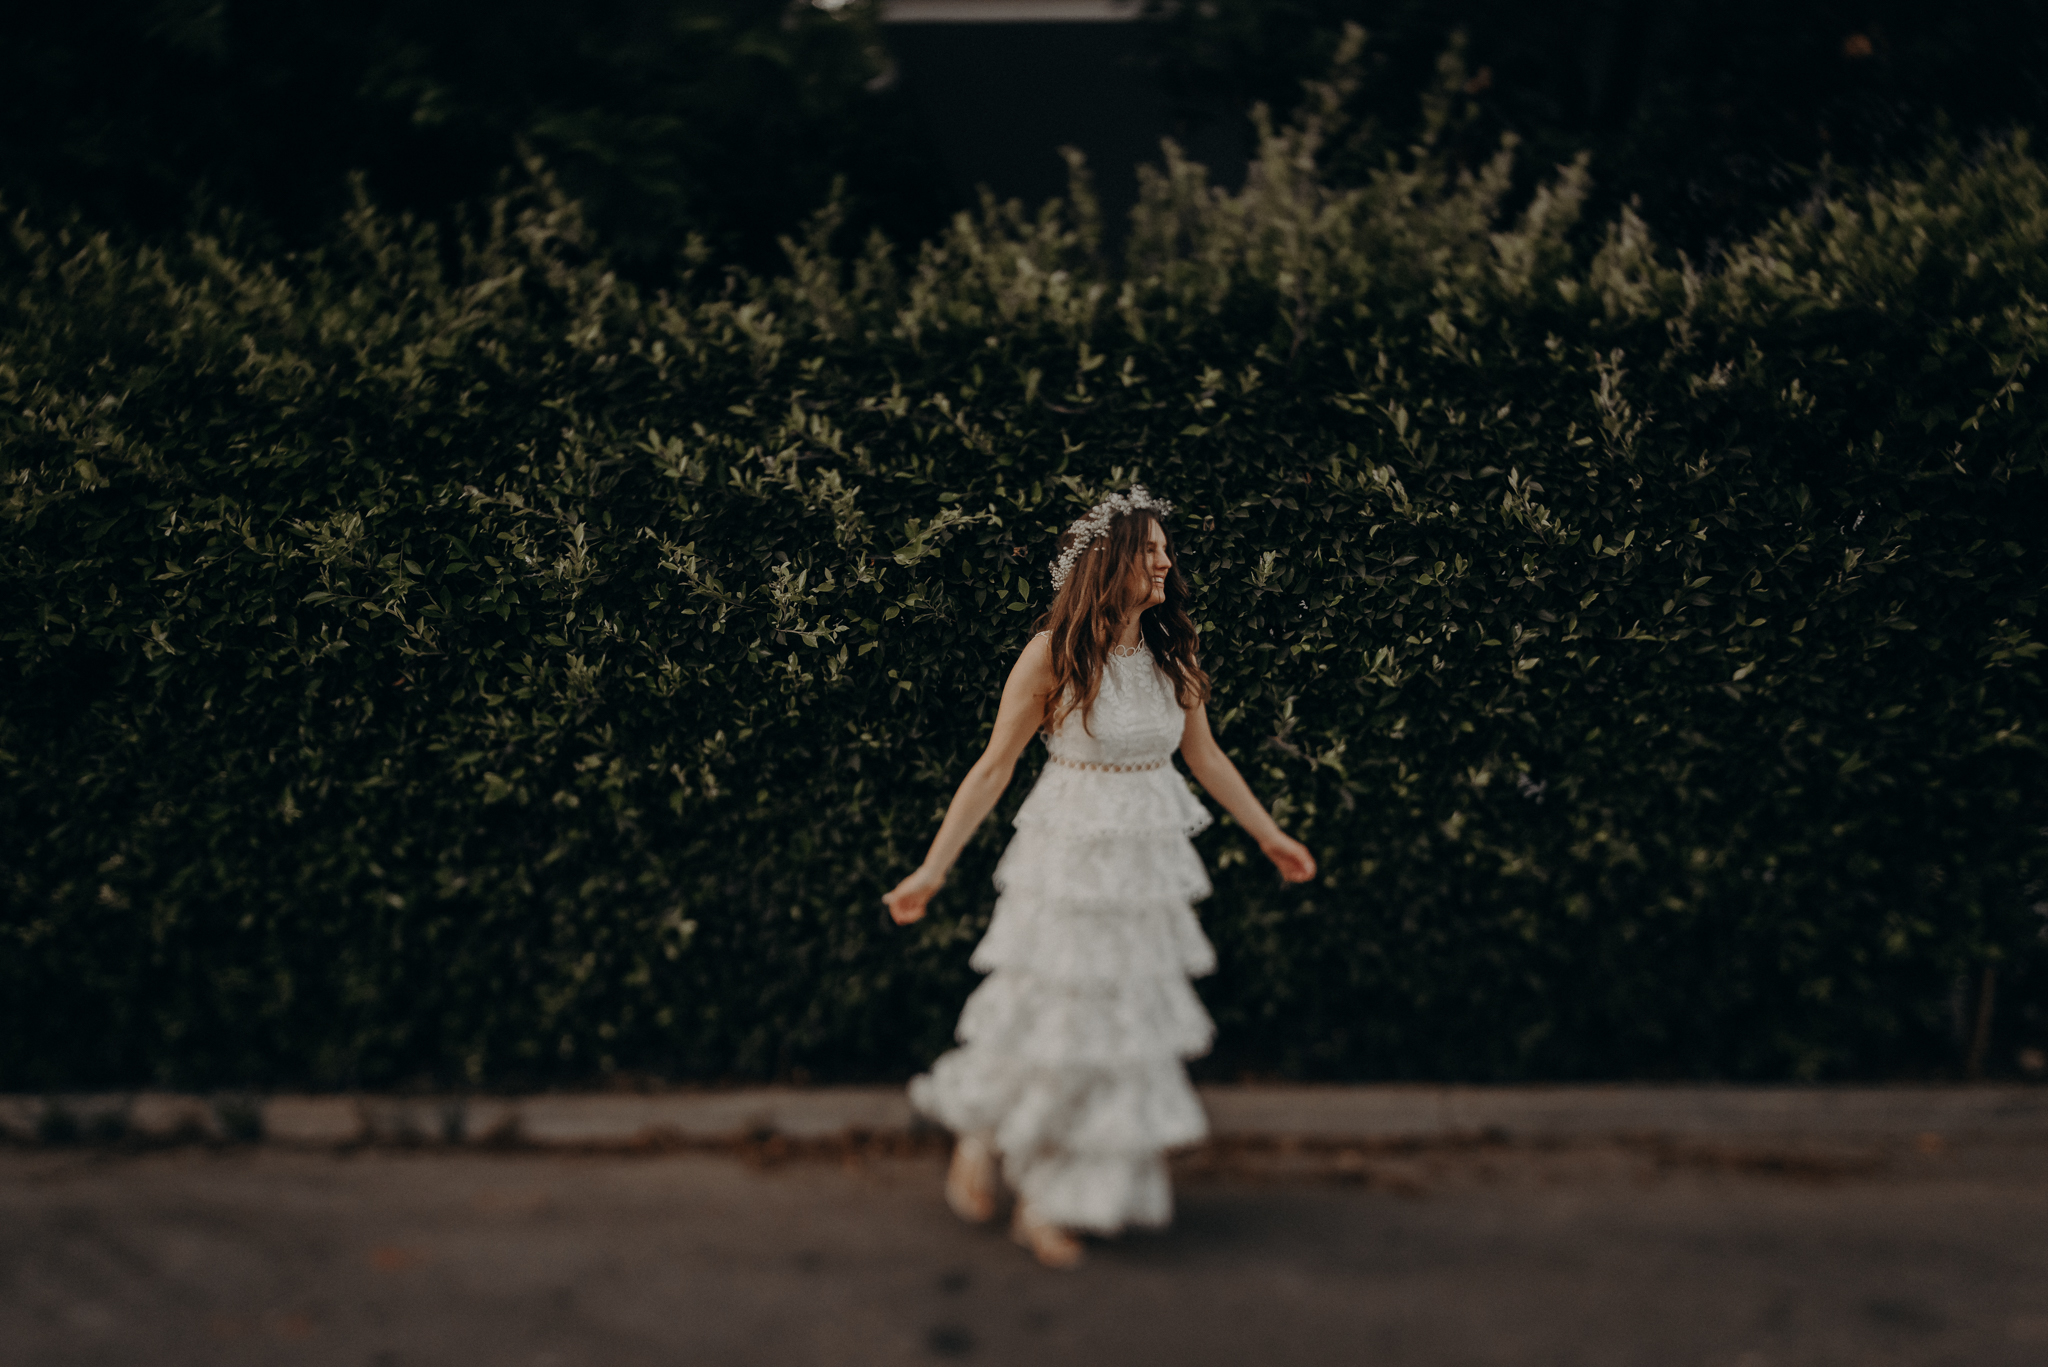 Isaiah + Taylor Photography - Private Estate Backyard Wedding - Beverly Hills - Los Angeles Wedding Photographer - 120.jpg